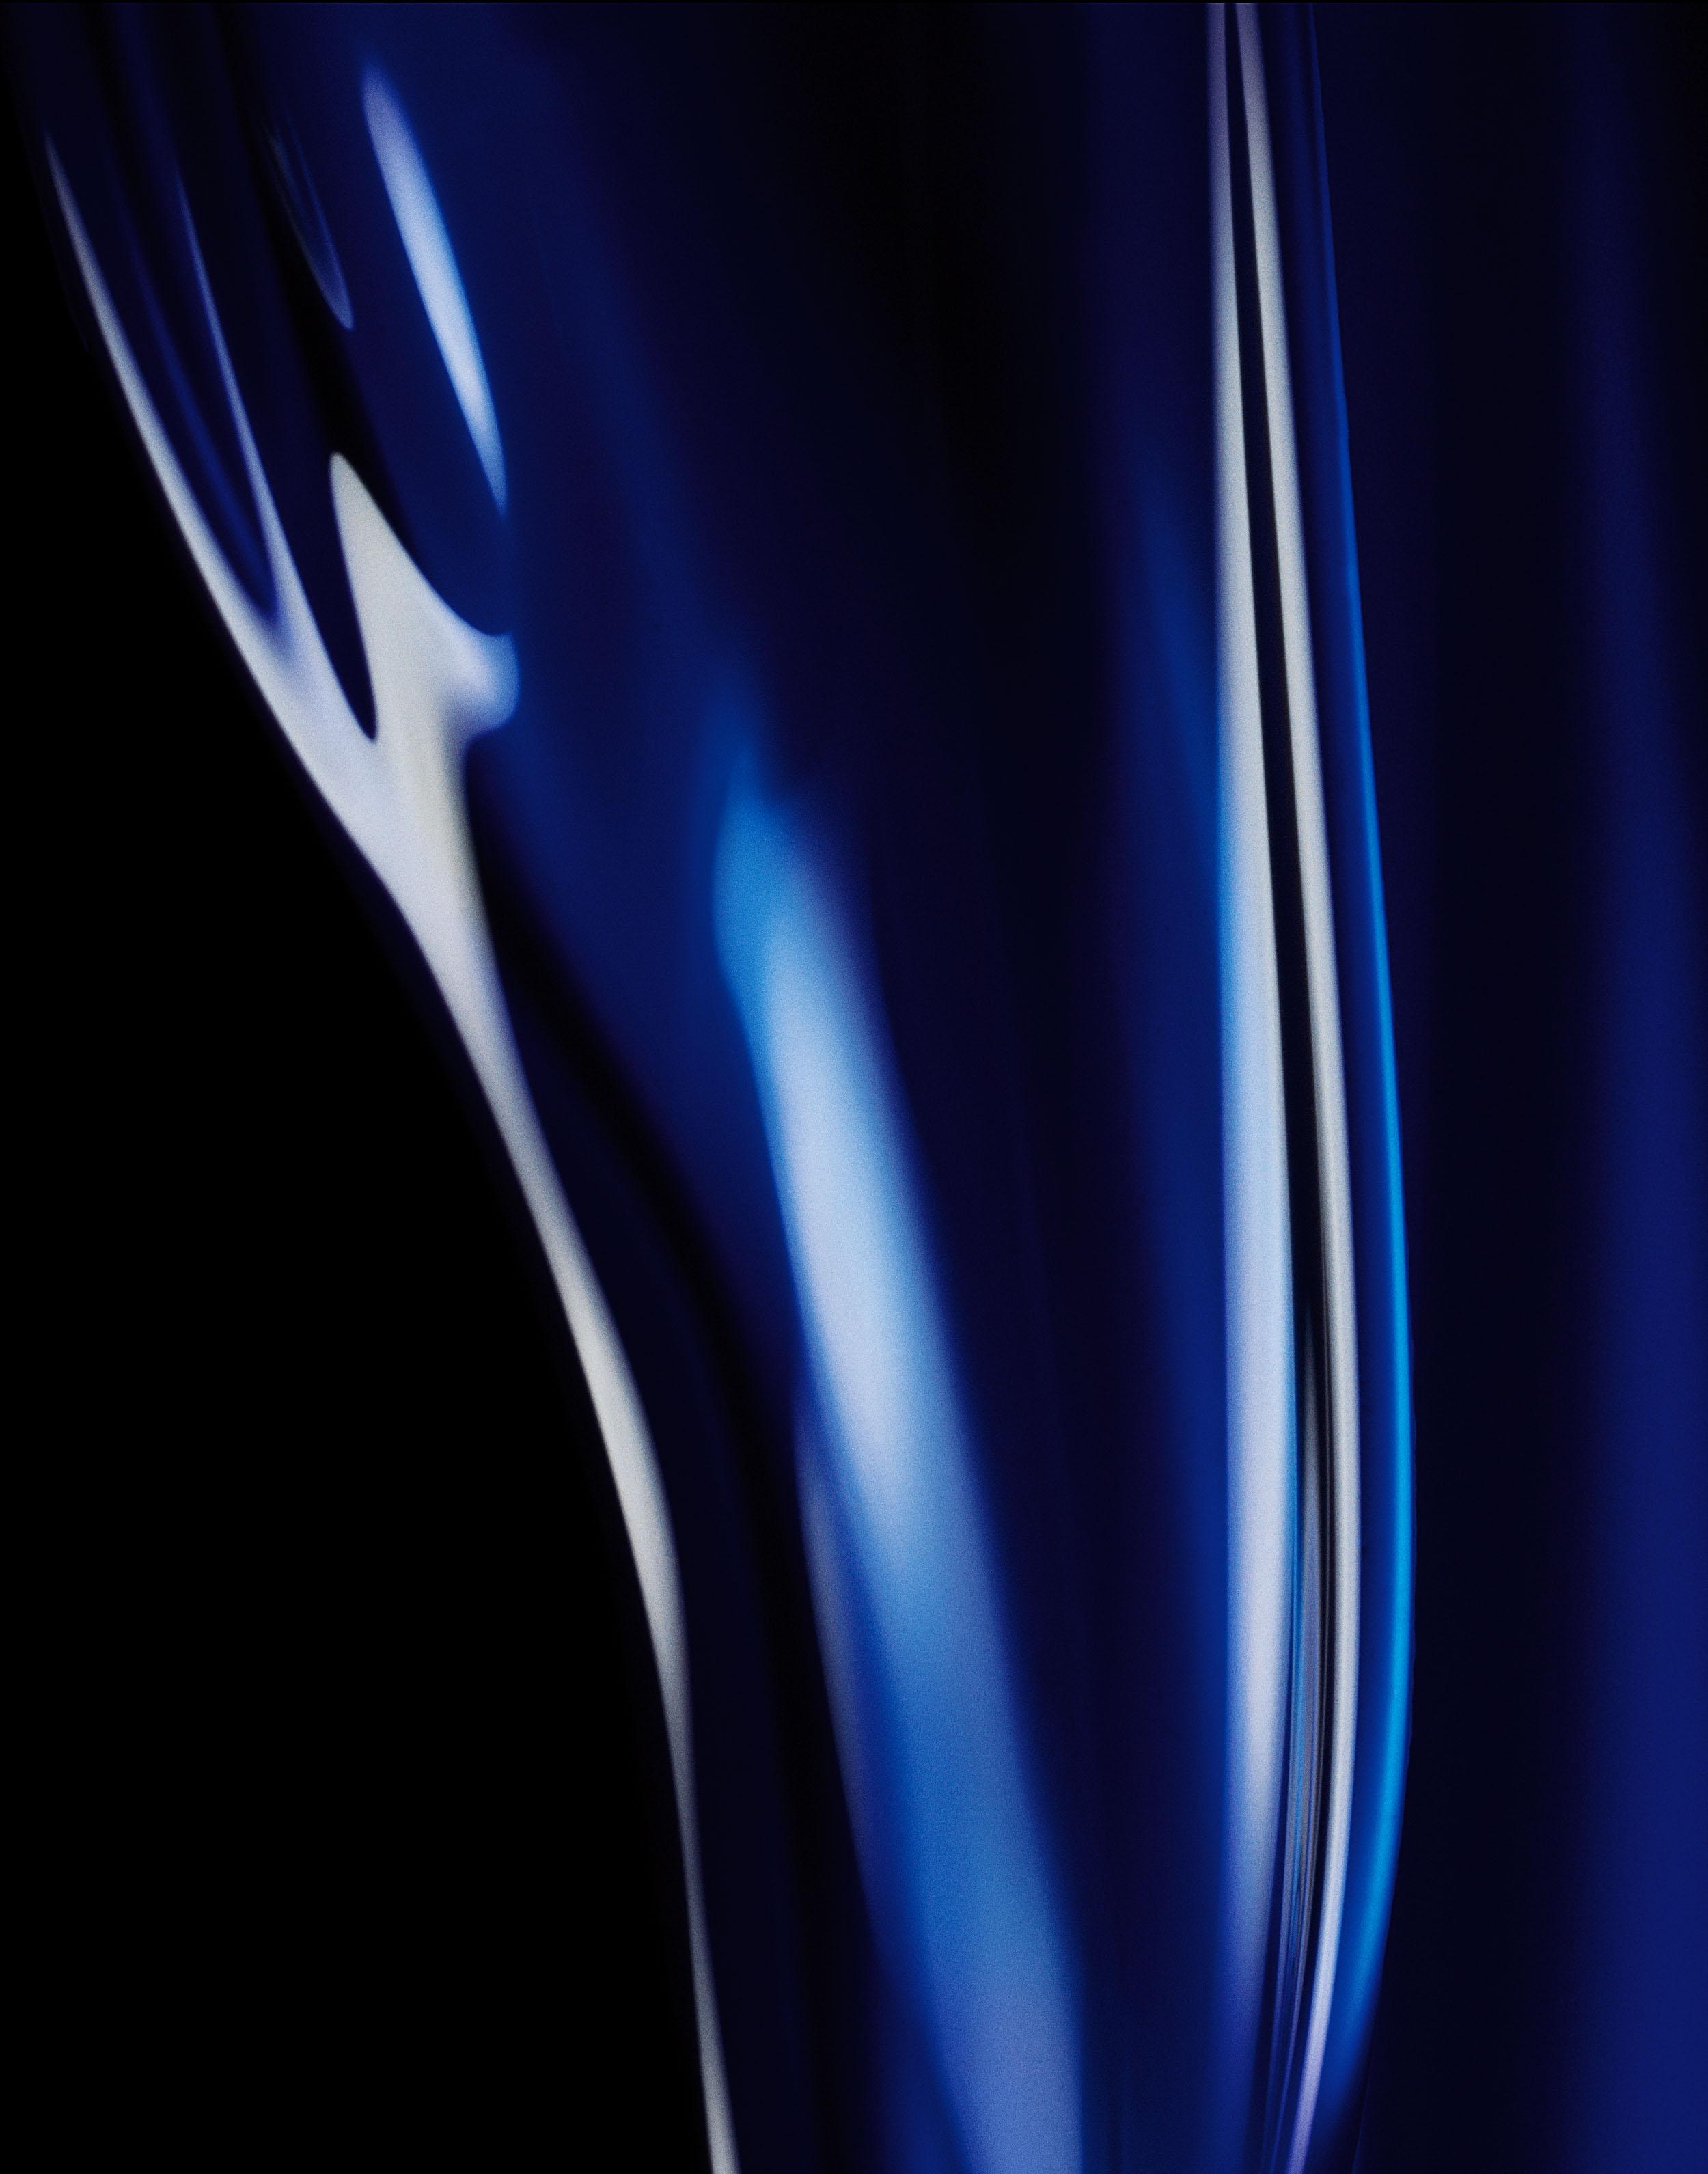 CAV_LL_BLUE LIQUID_MOOD-crop copy.jpg